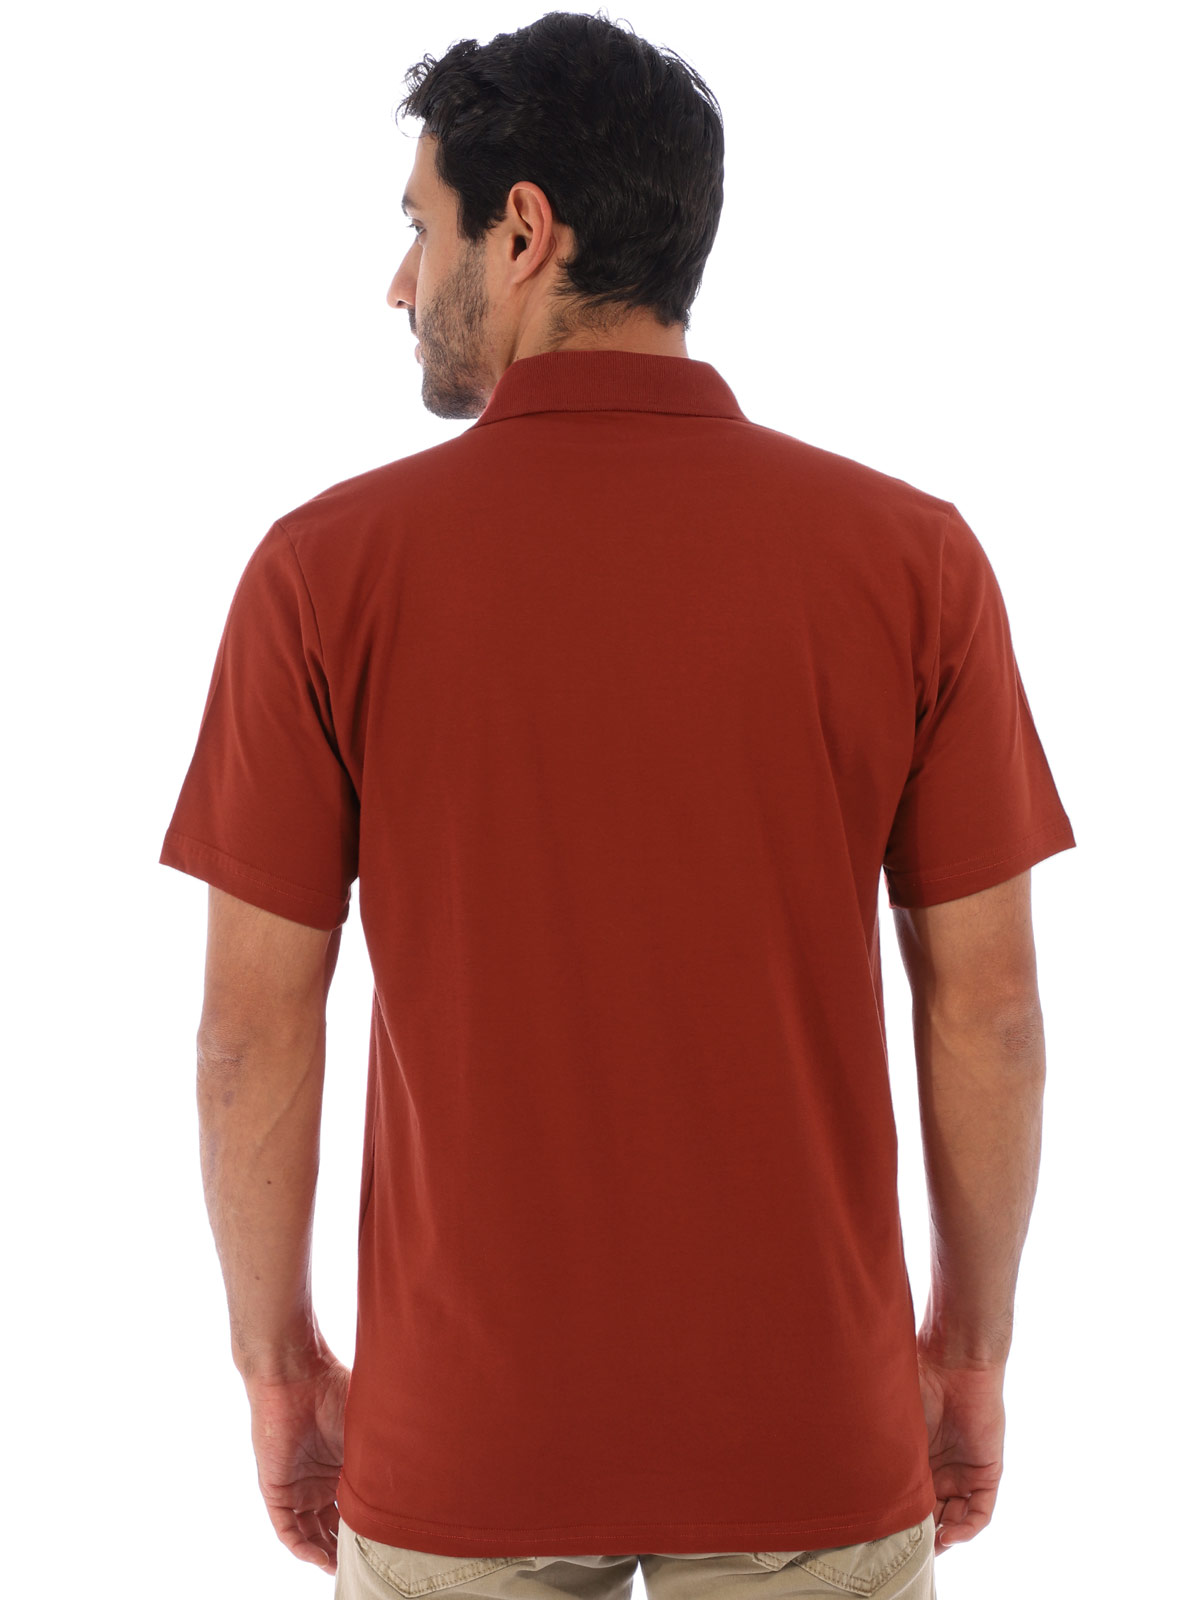 Camisa Polo Masculina Básica Algodão Lisa Conforto Tijolo